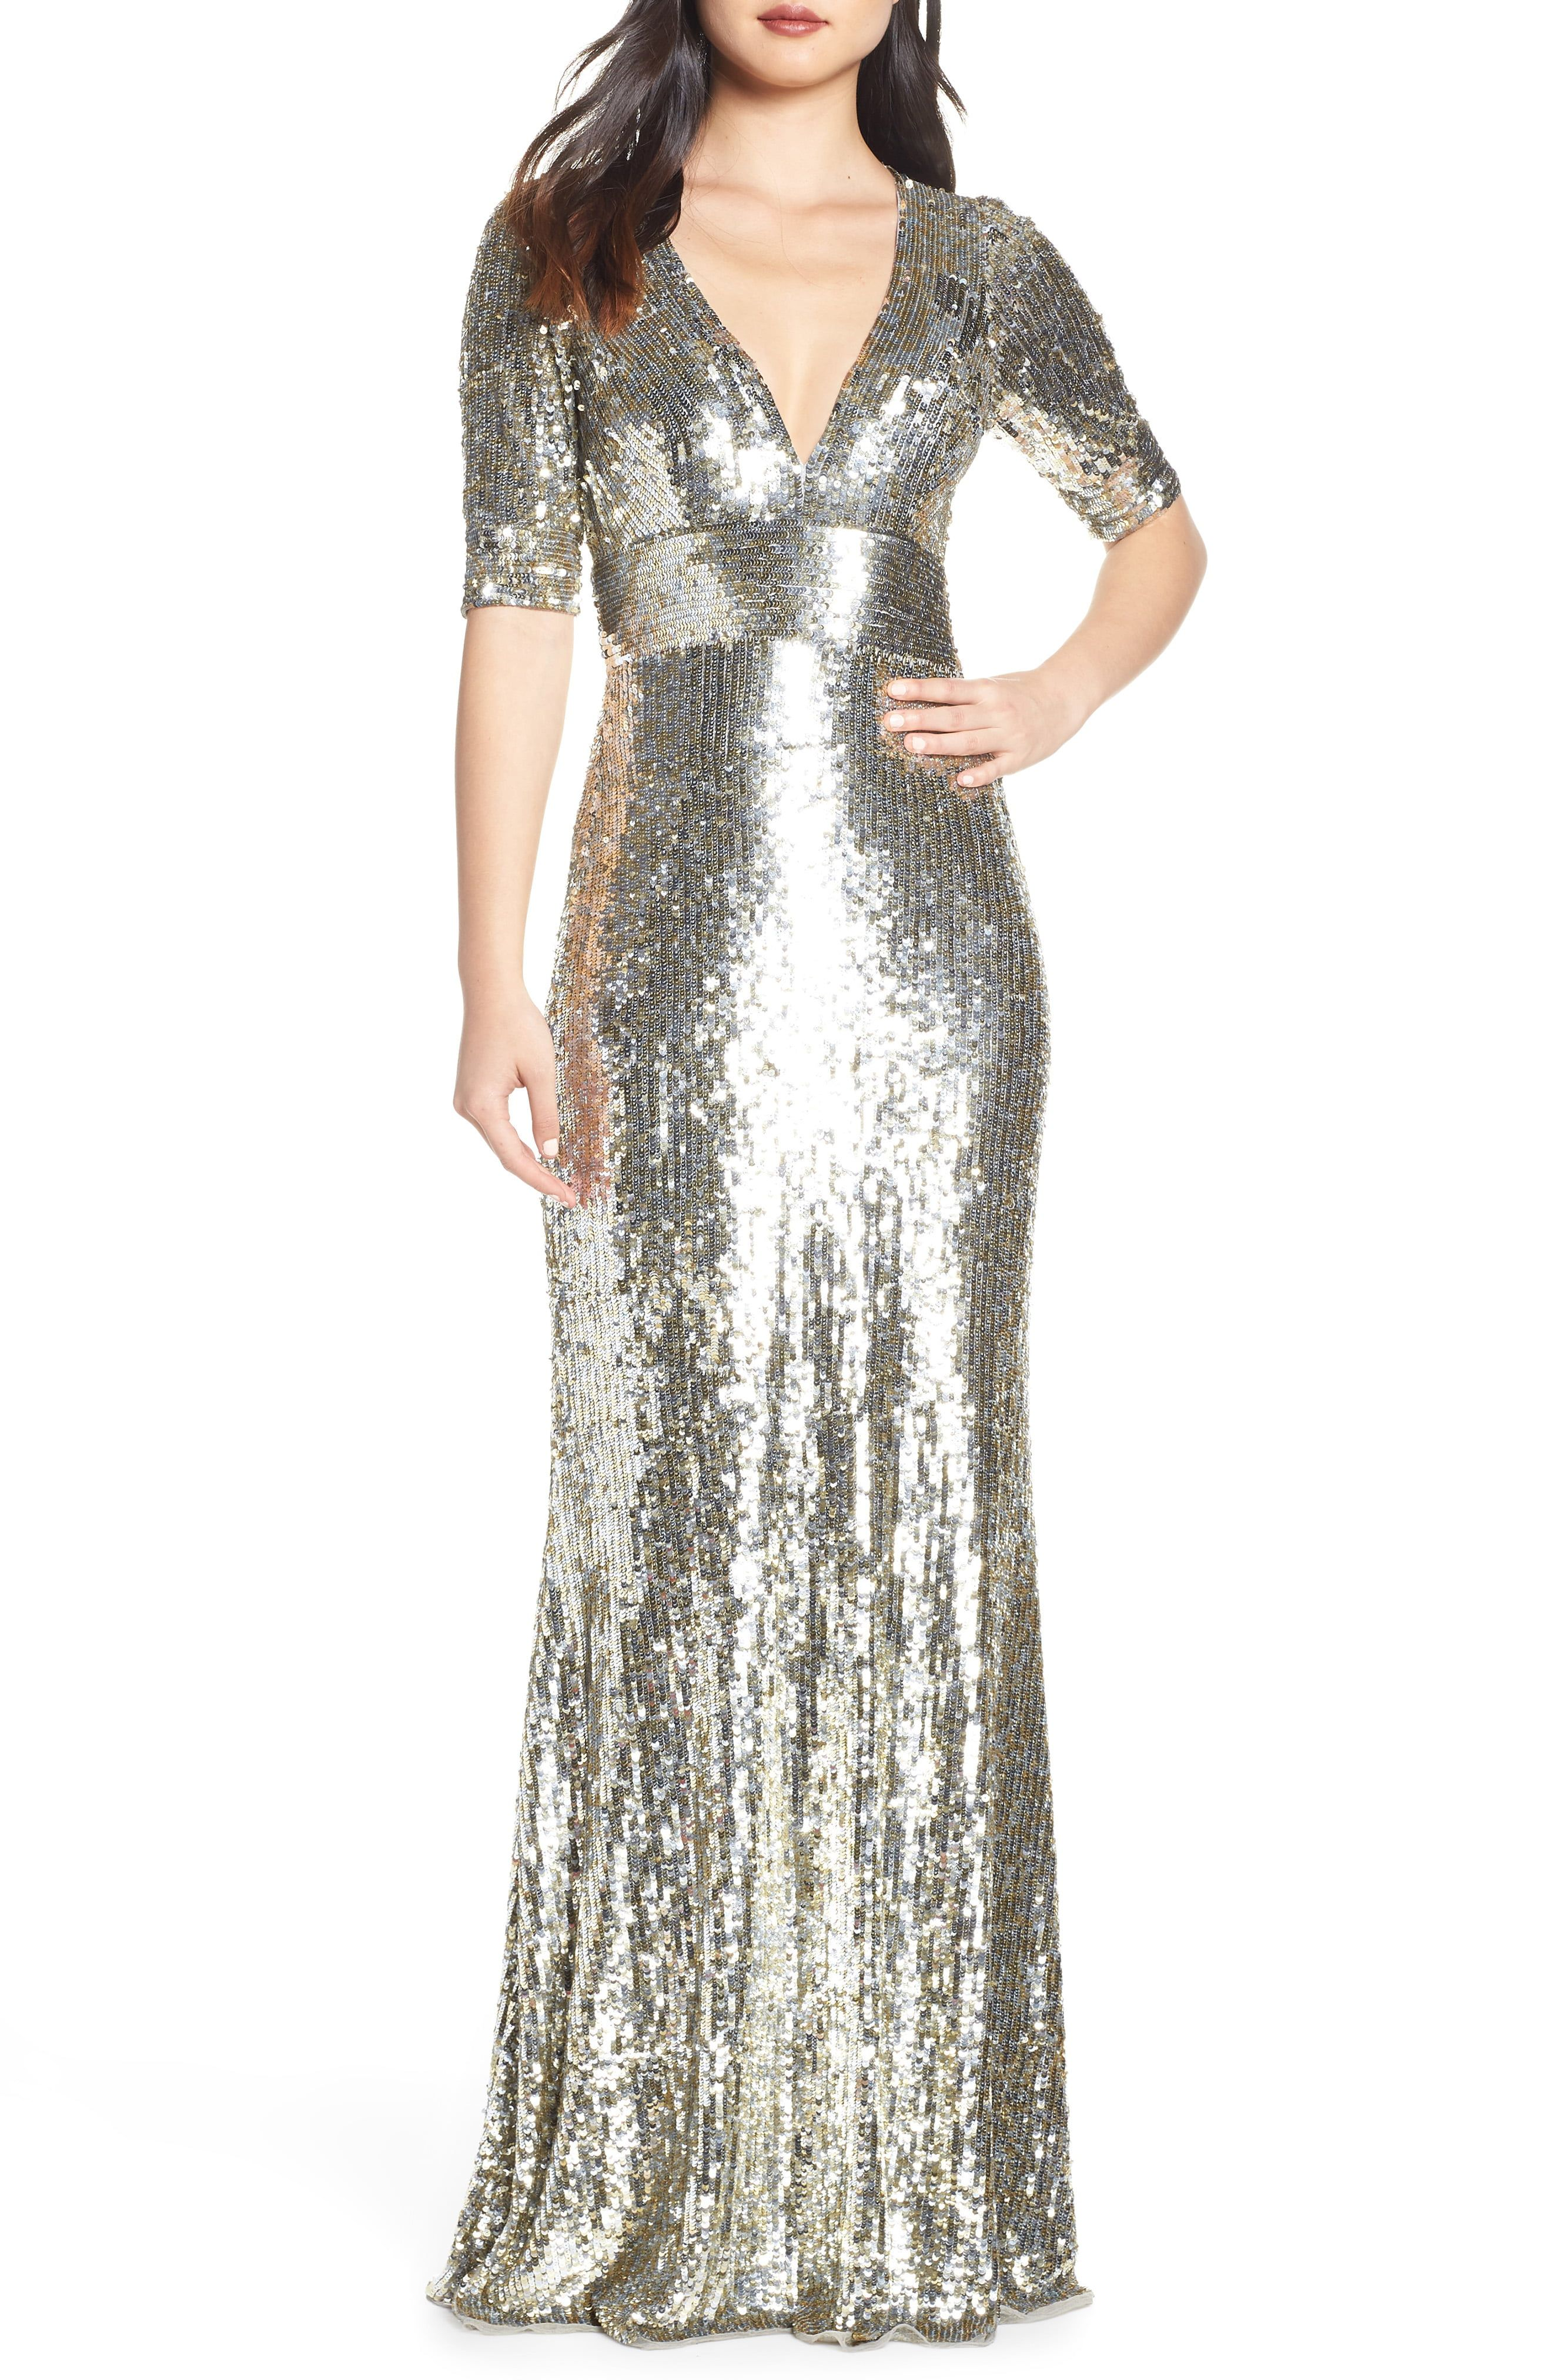 Mac Duggal Sequin Stripe Evening Dress Nordstrom Evening Dresses Sparkly Dress Nordstrom Dresses [ 4048 x 2640 Pixel ]